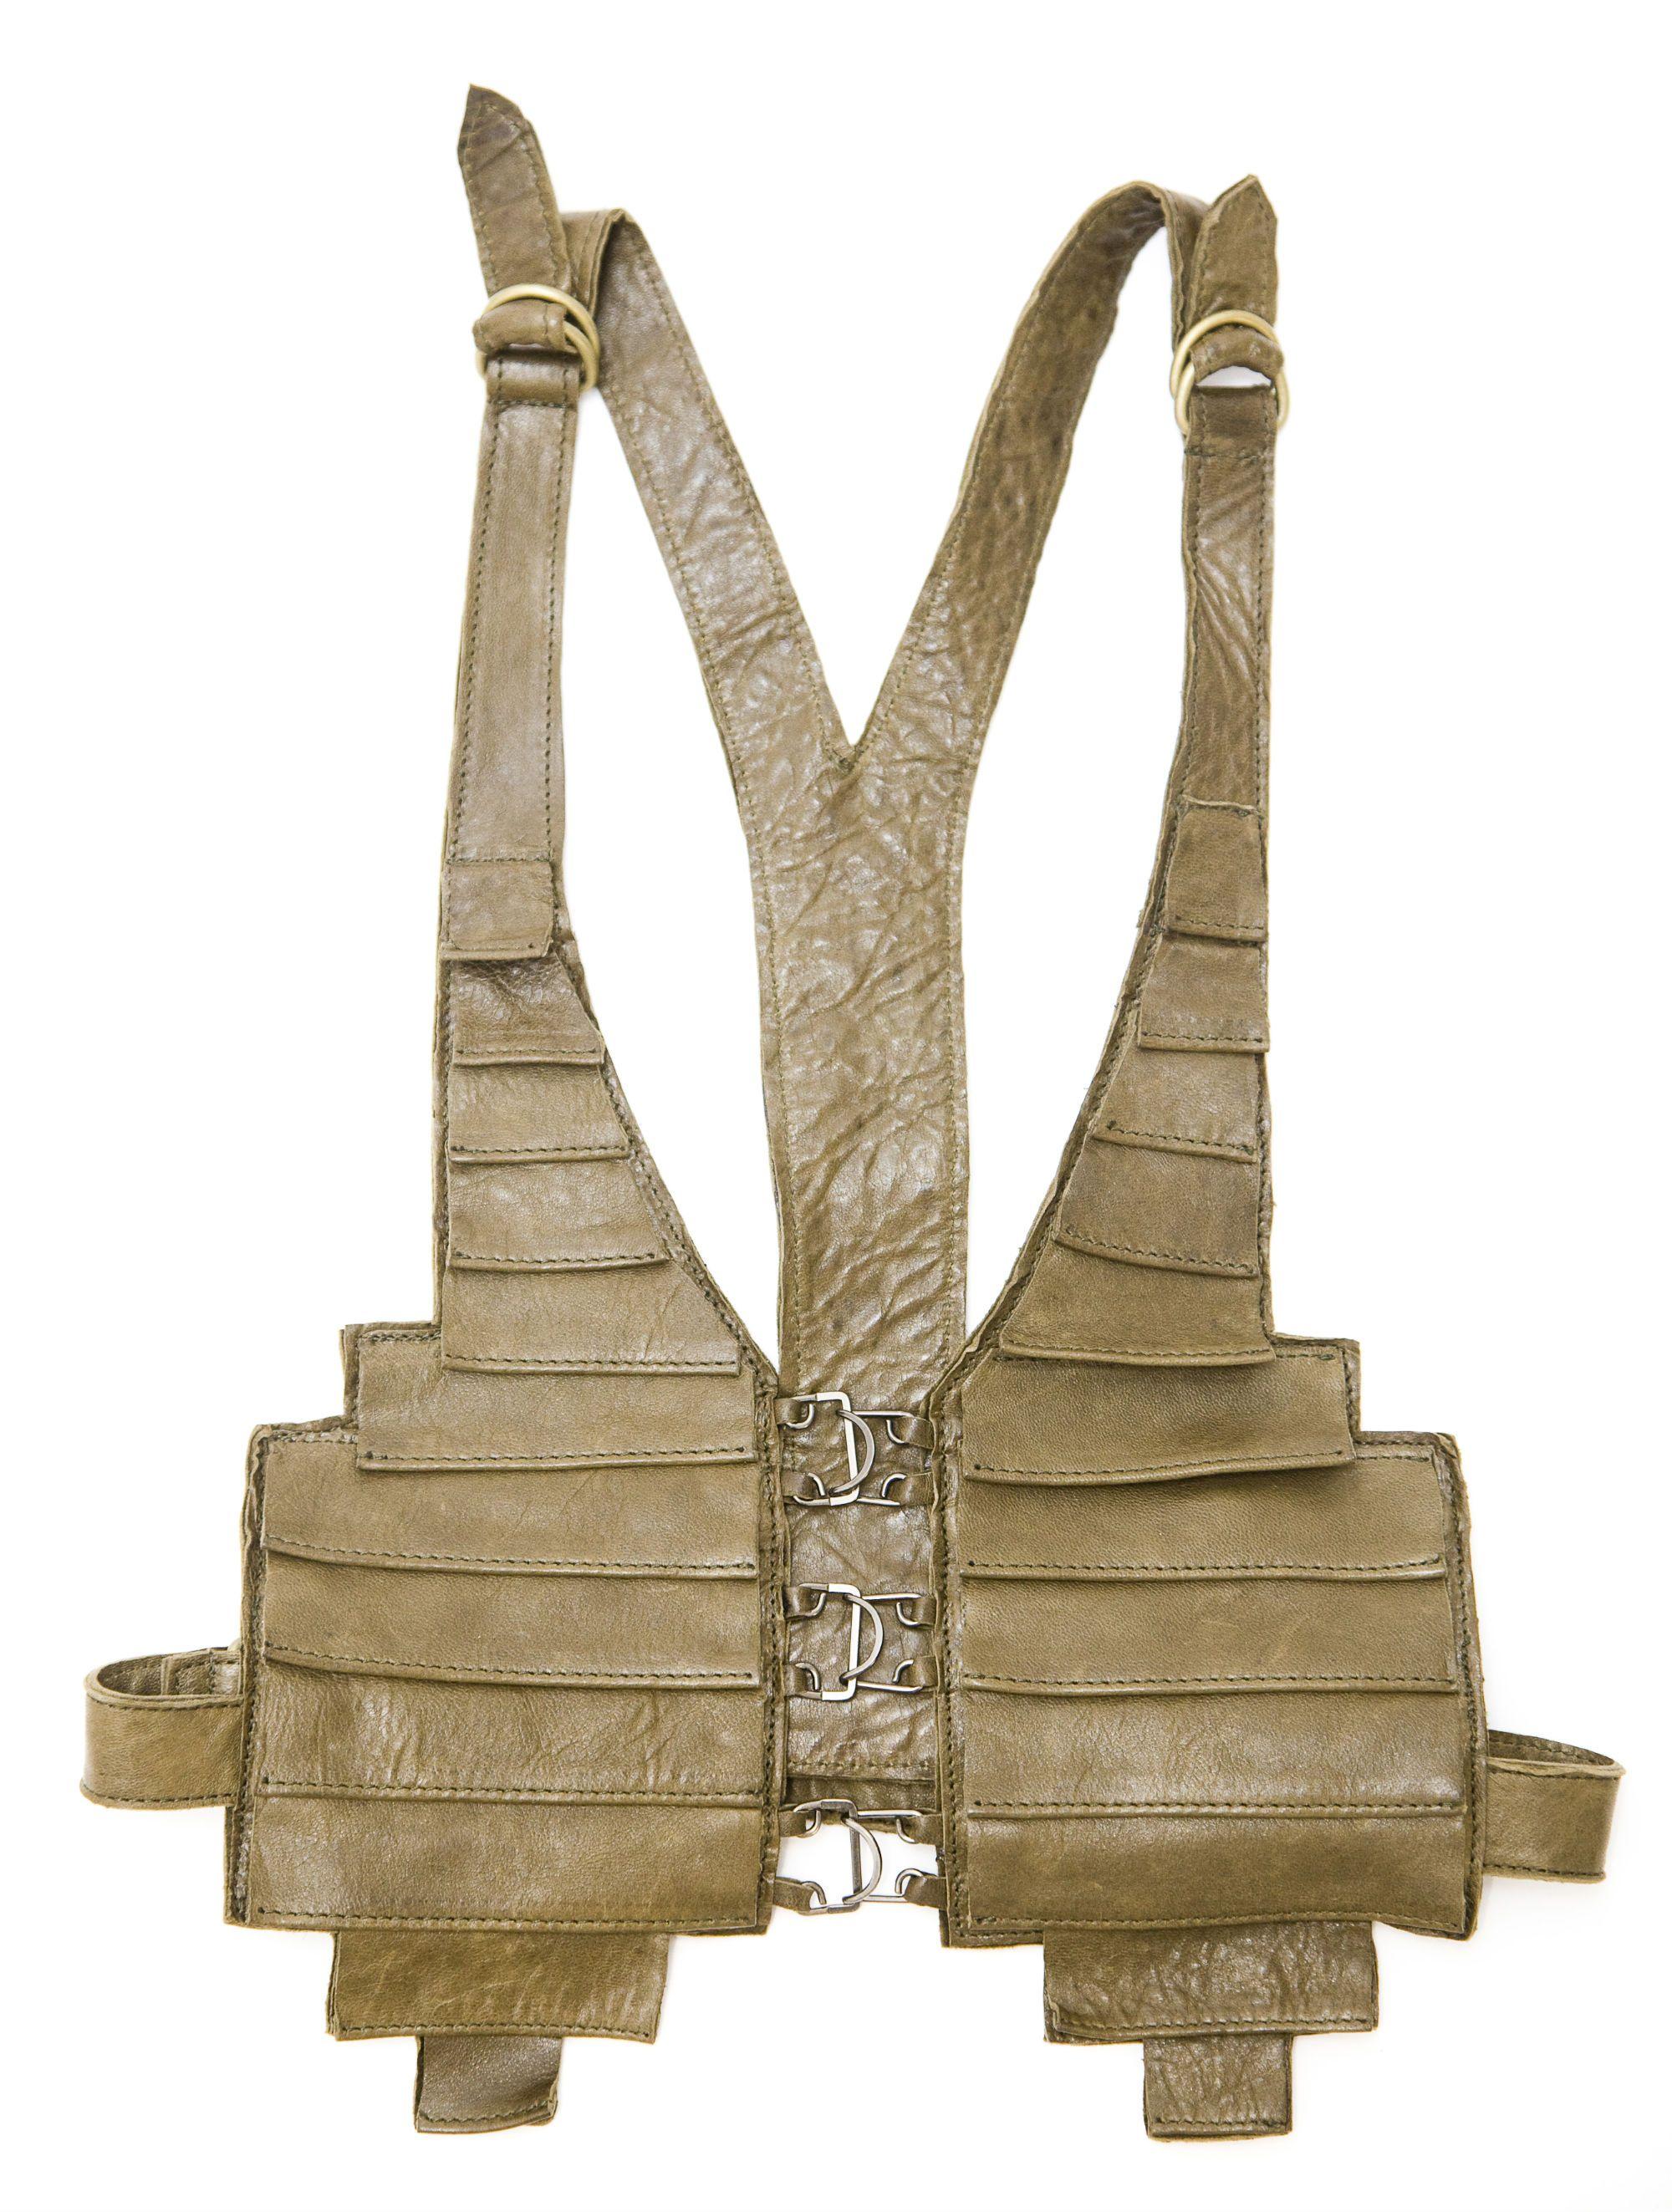 Quorra Harness by Collina Strada $280.00